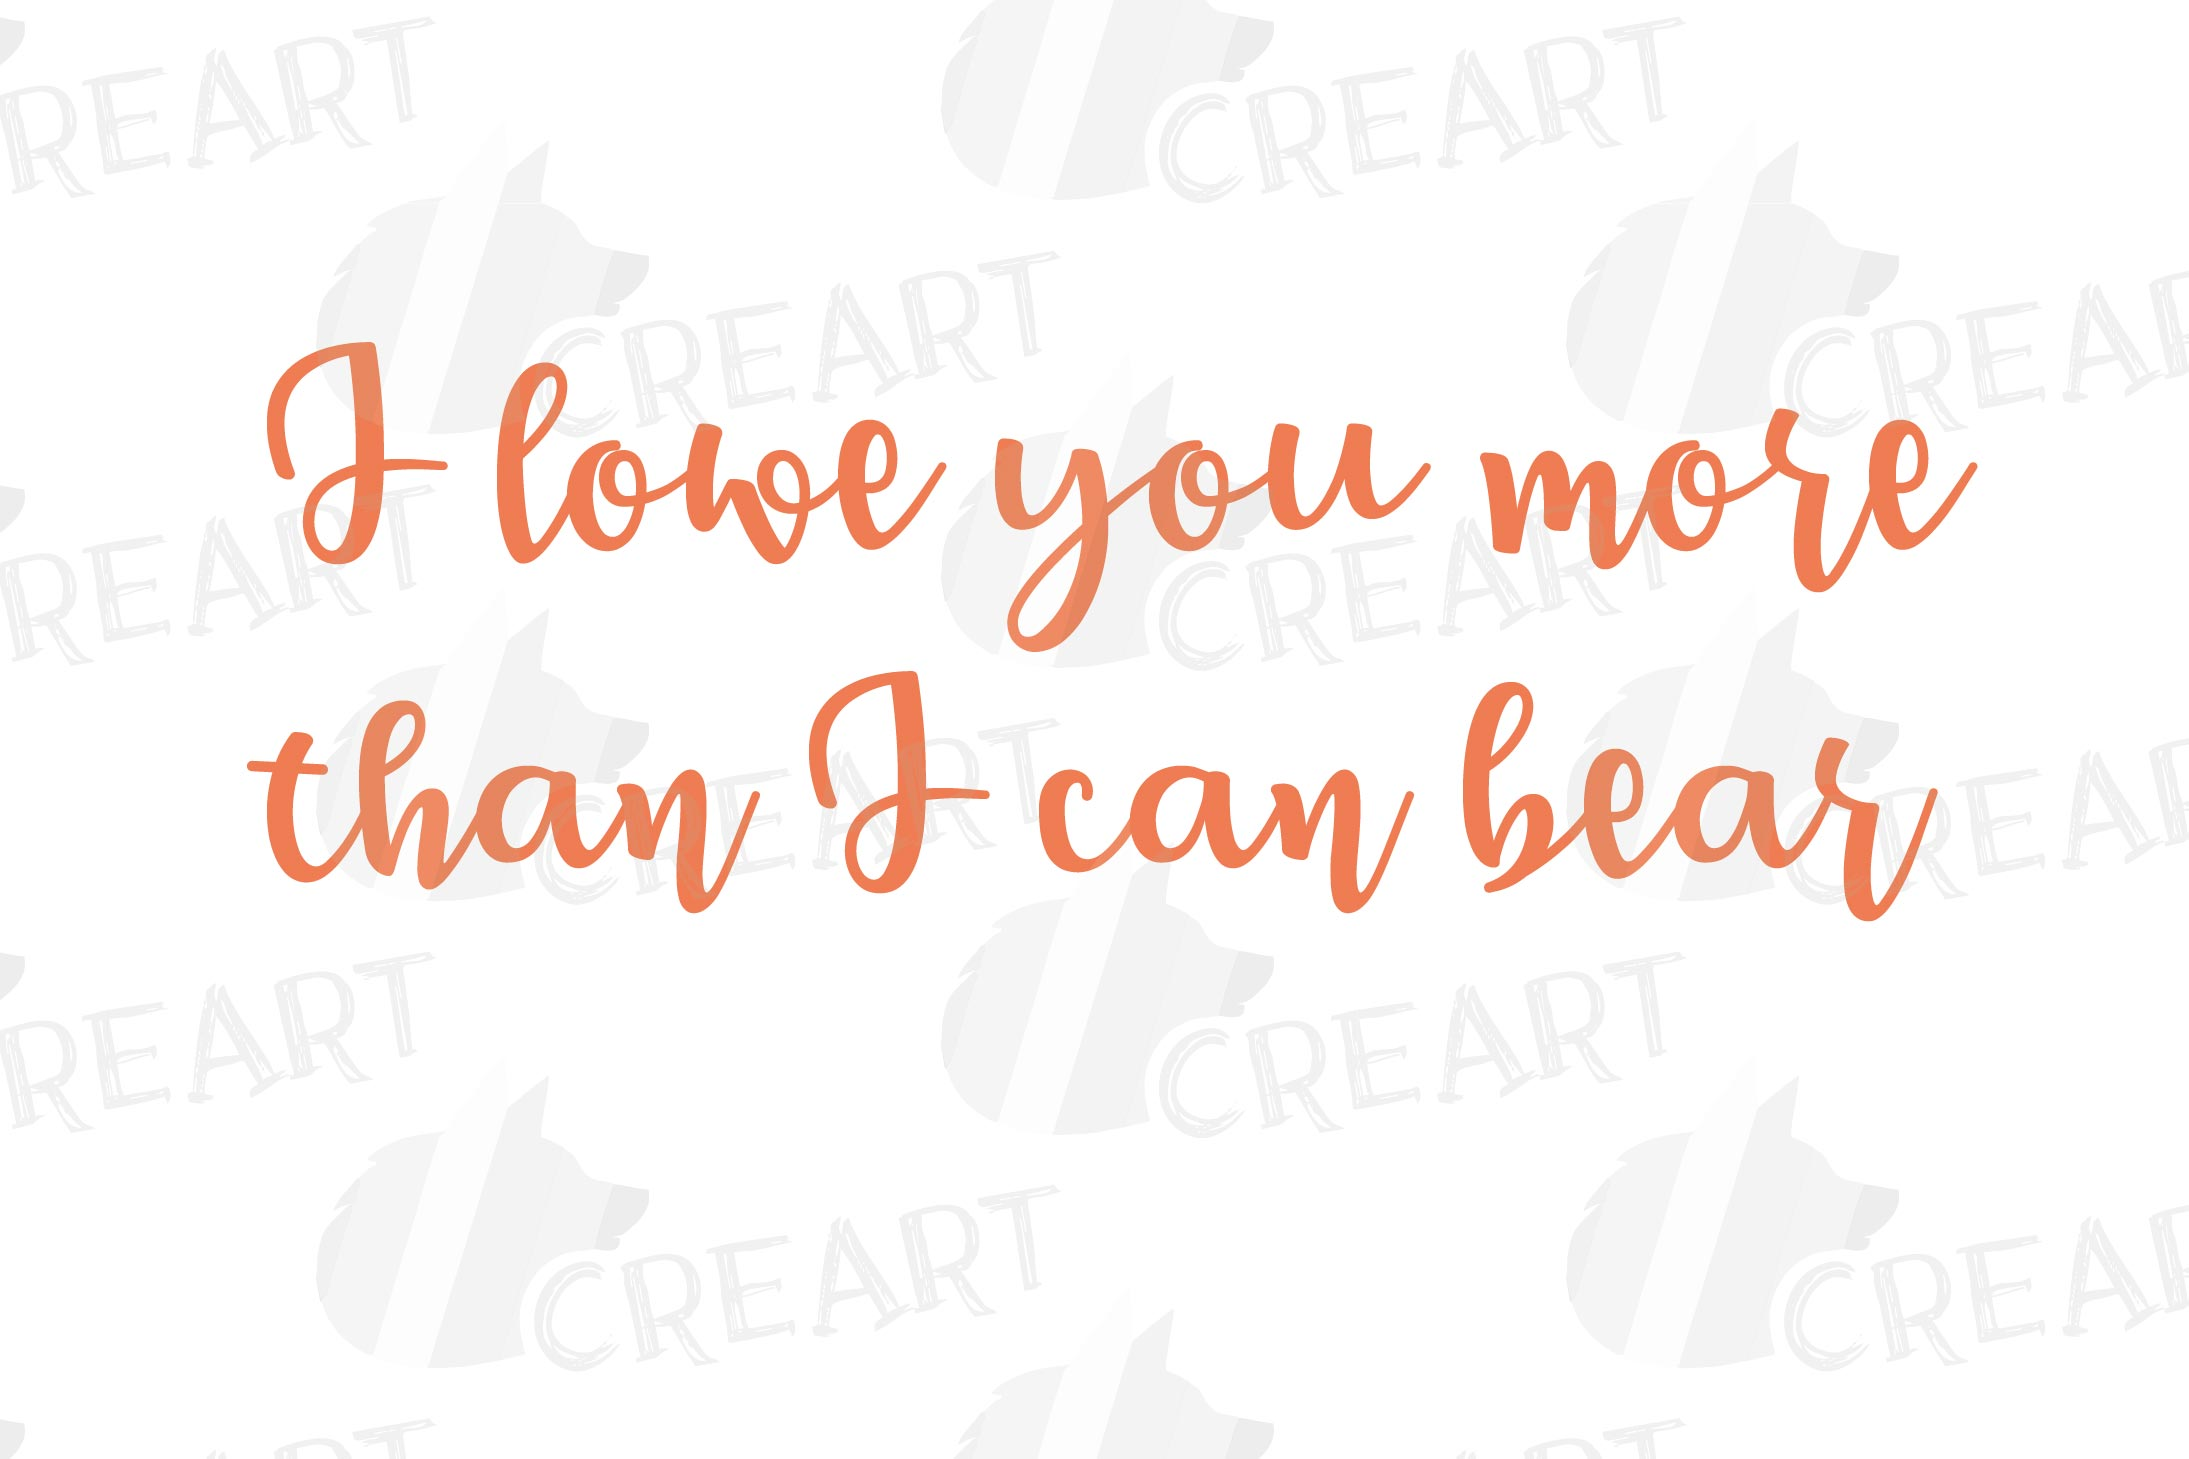 Baby and mama bear nursery clip art collection, bears print example image 5